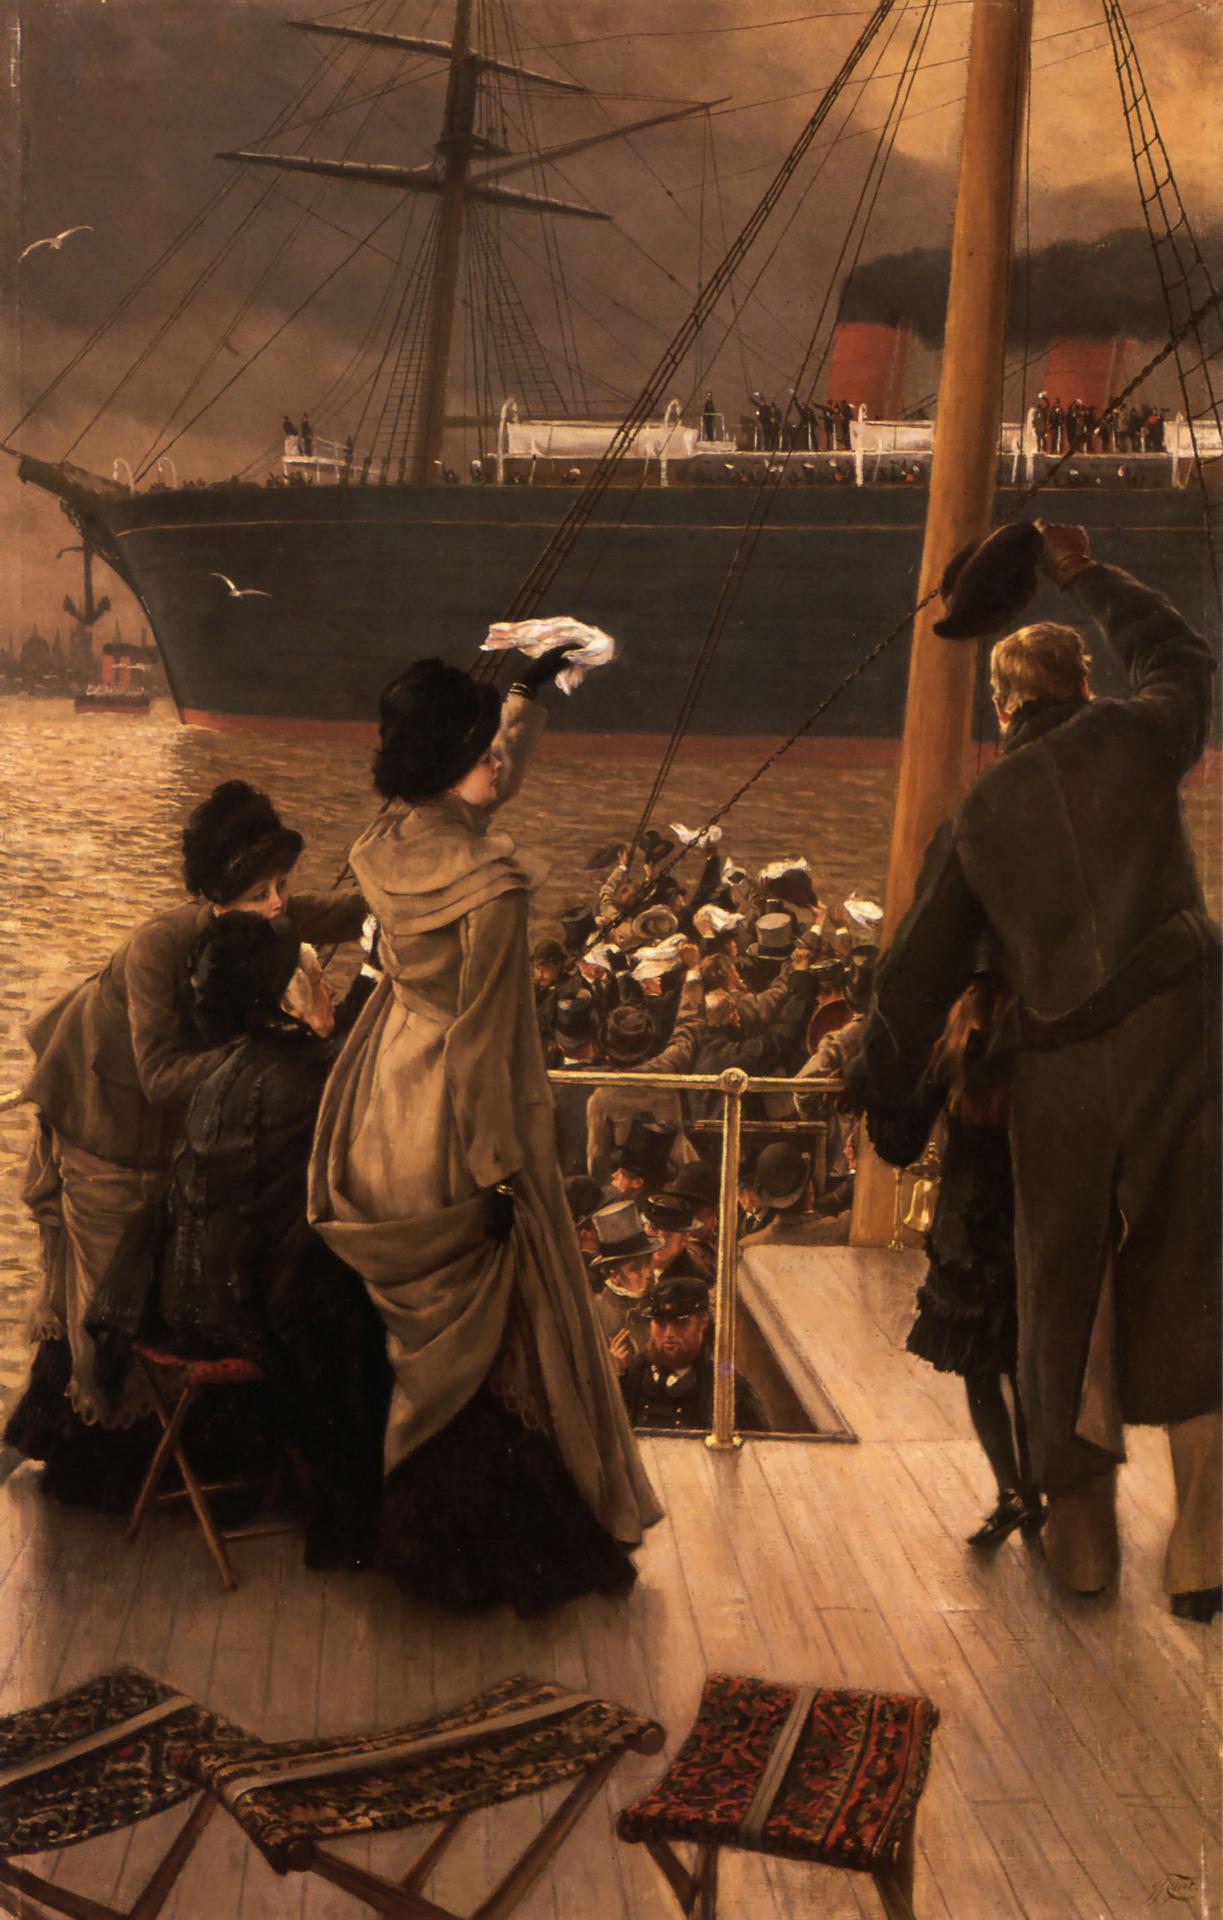 James Jacques Joseph Tissot - Goodbye on the Mersey, 1881